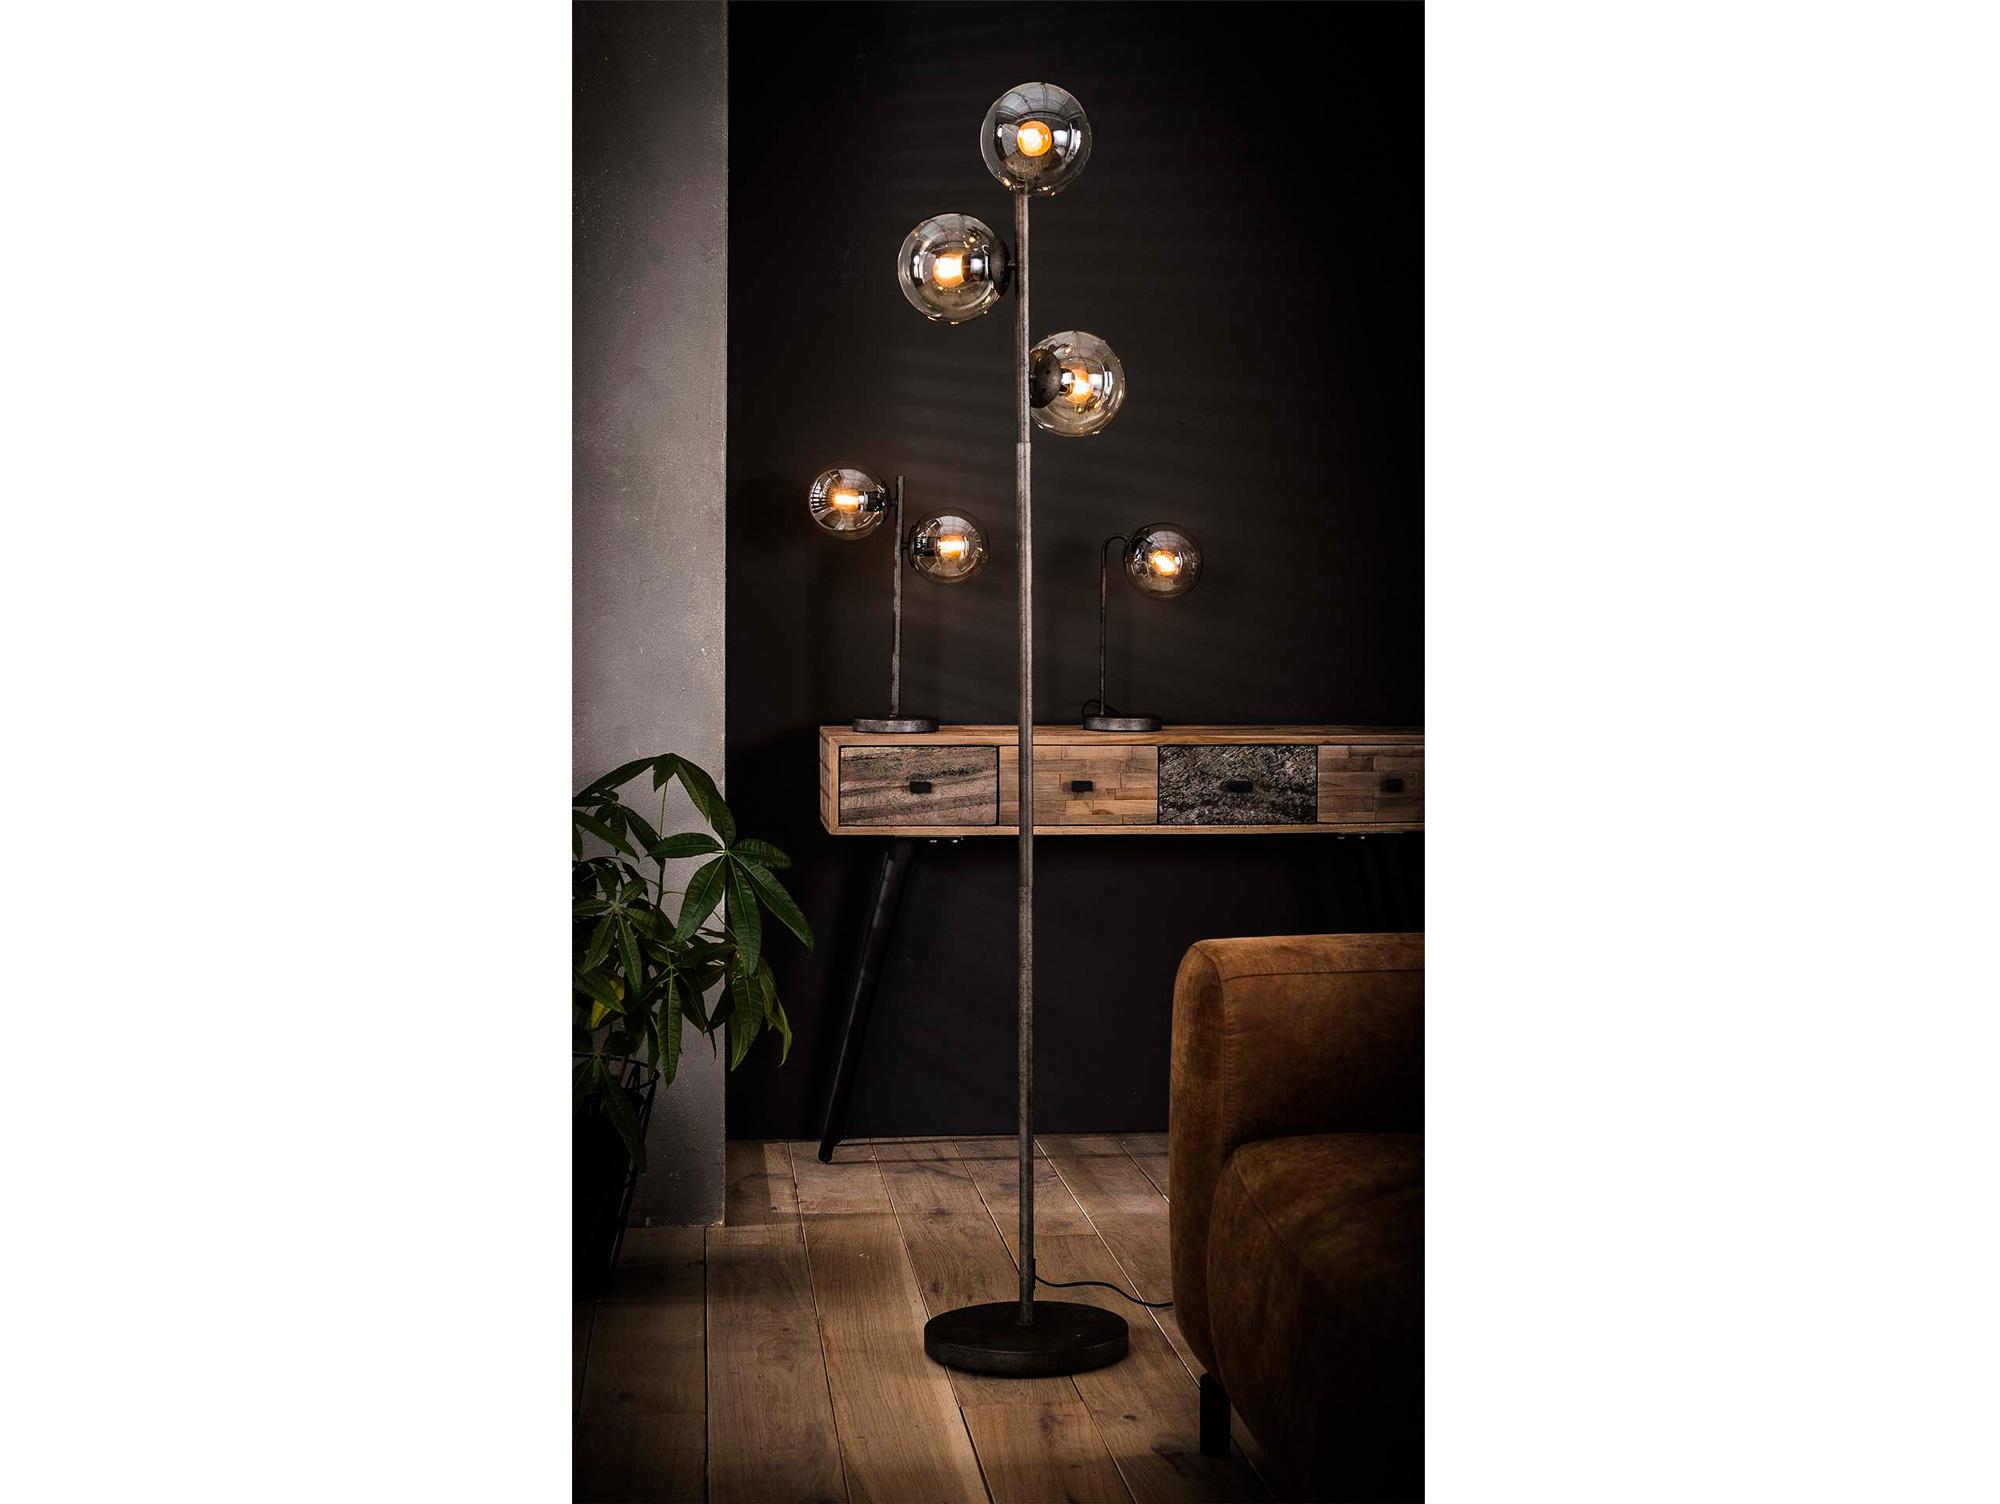 marim stehlampe schwarz mit 3 glaskugeln. Black Bedroom Furniture Sets. Home Design Ideas